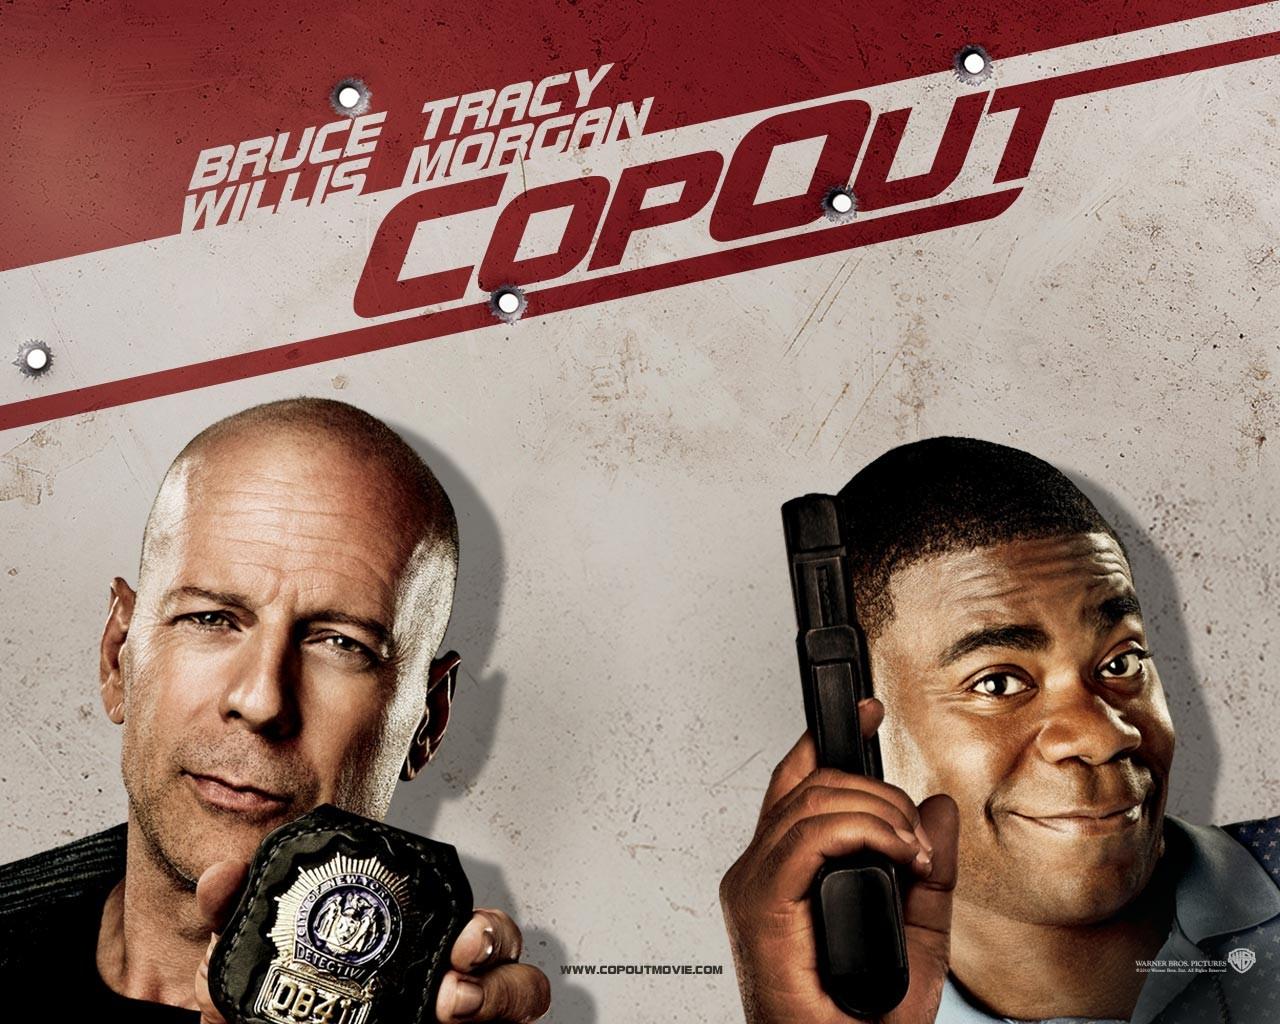 Poster di Bruce Willis e Tracy Morgan per Cop Out